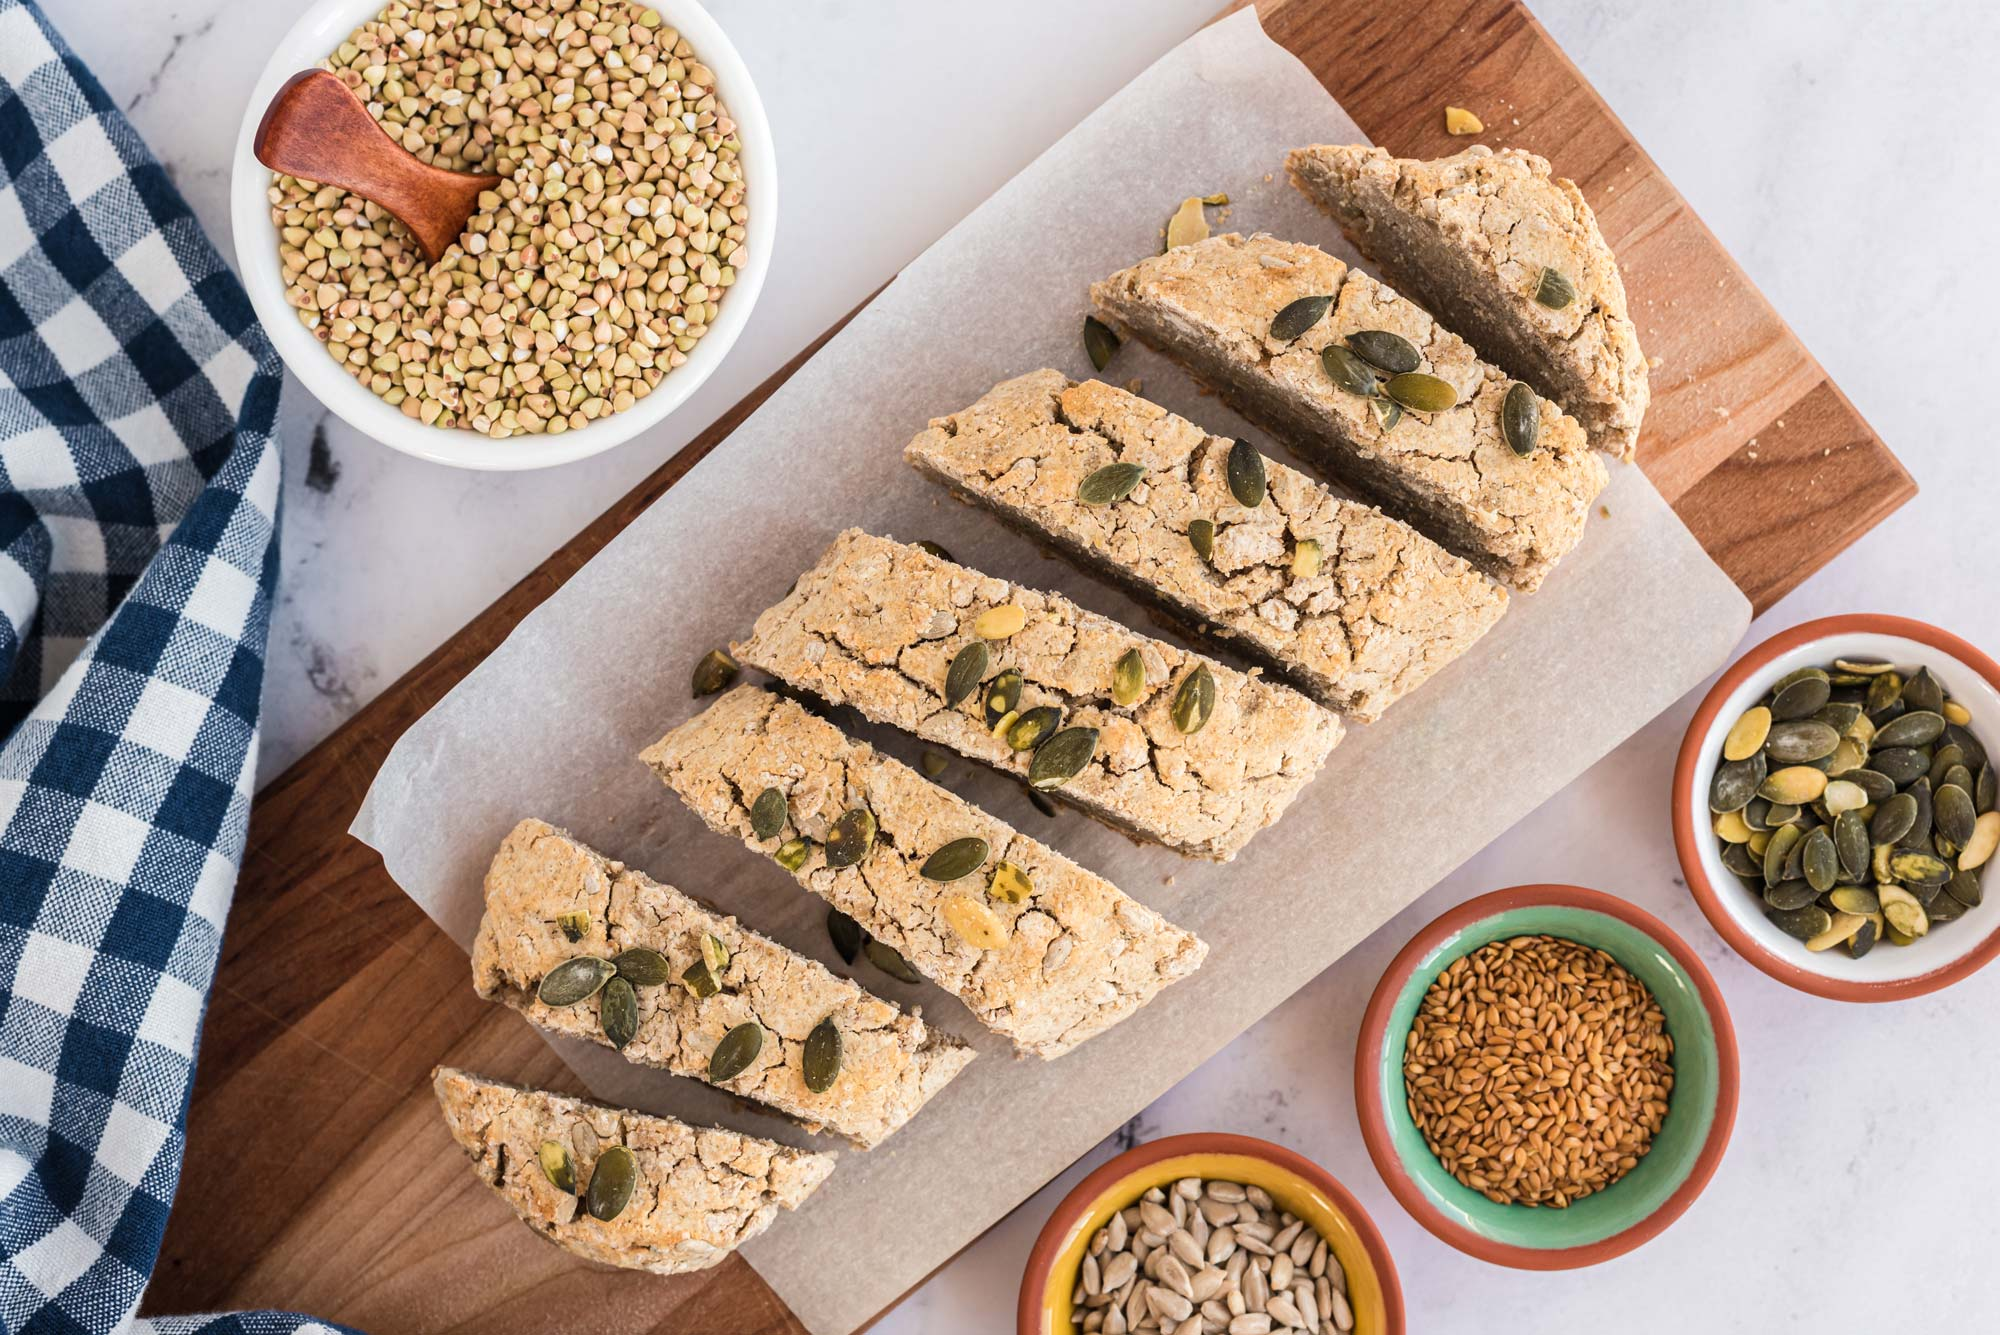 3 seed fermented buckwheat gluten-free bread sliced on cutting board